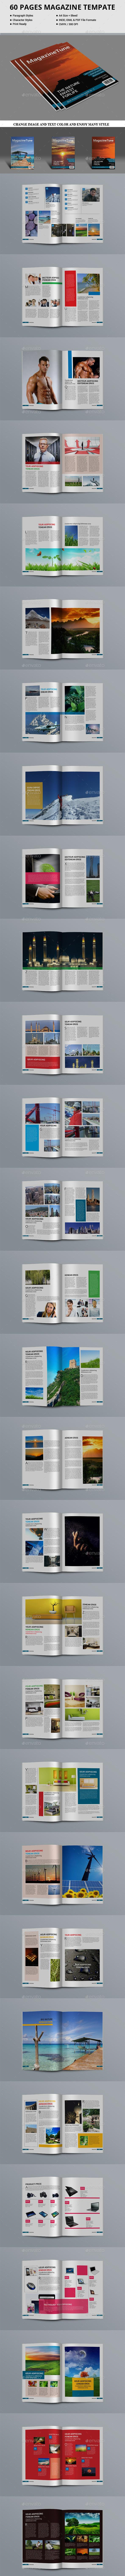 60 Pages Magazine Templates - Magazines Print Templates